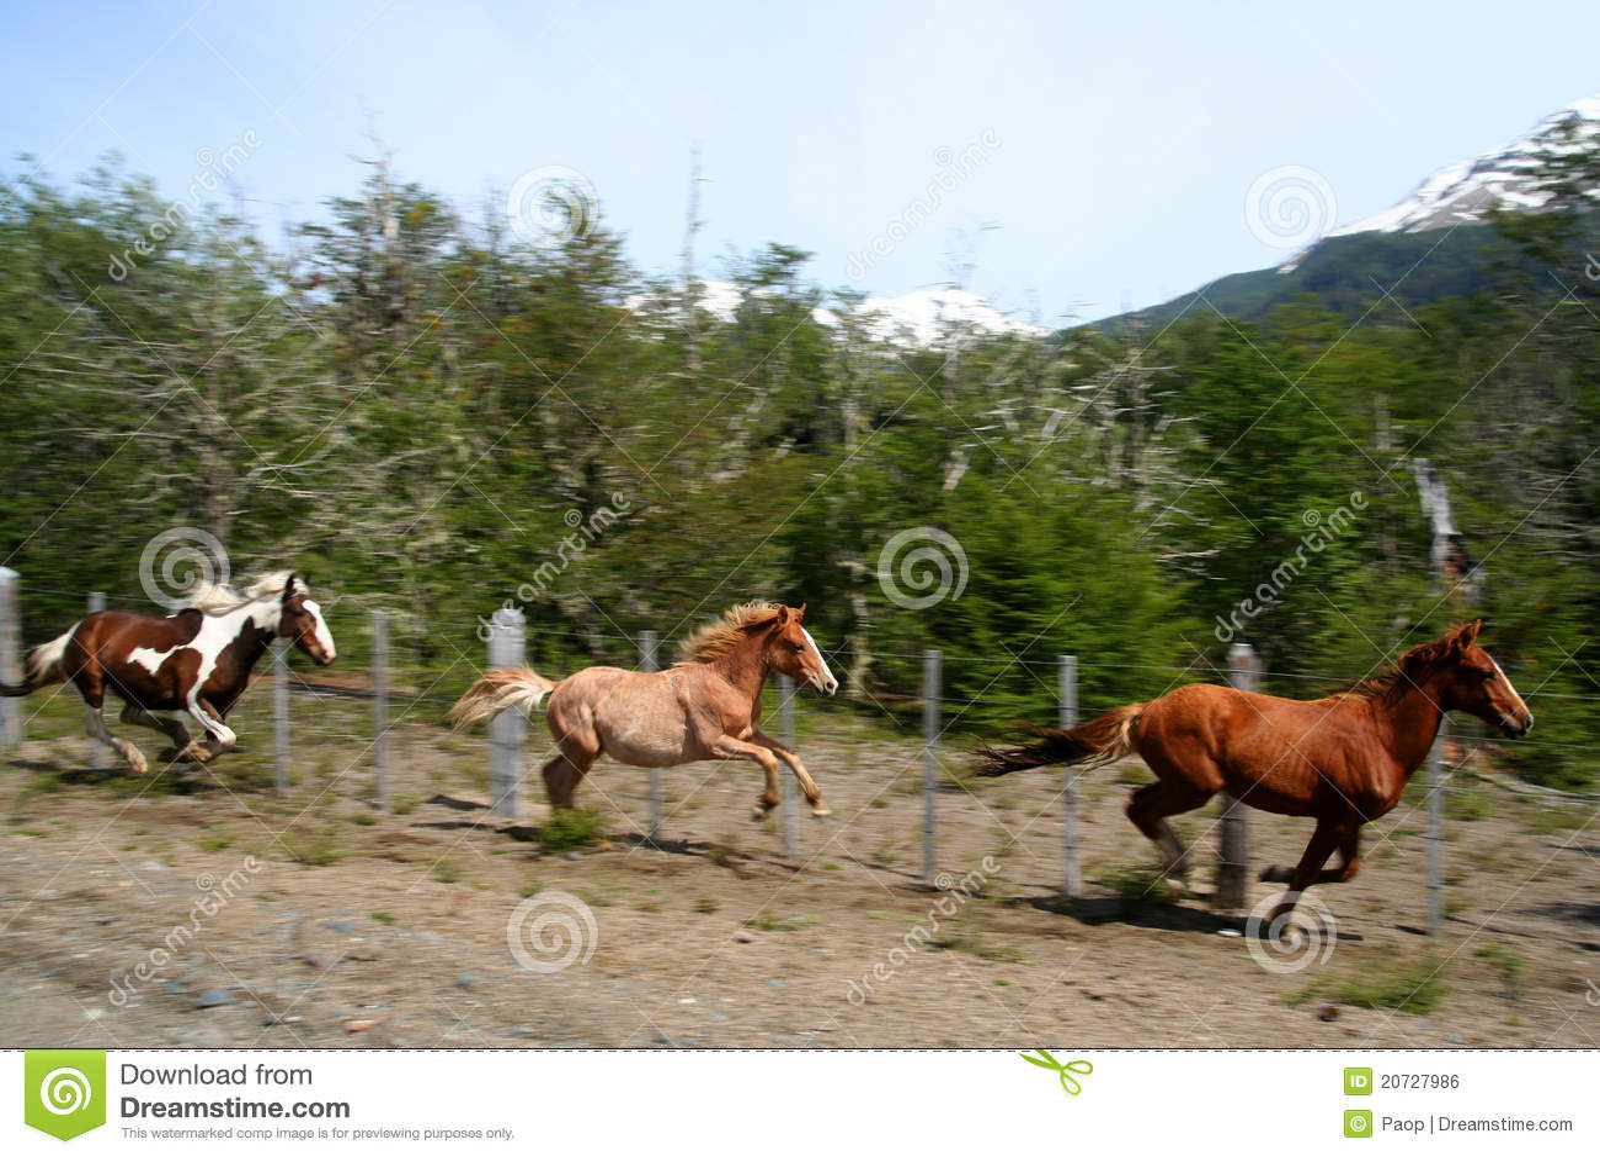 Three Running Horses Royalty Free Stock Image Image